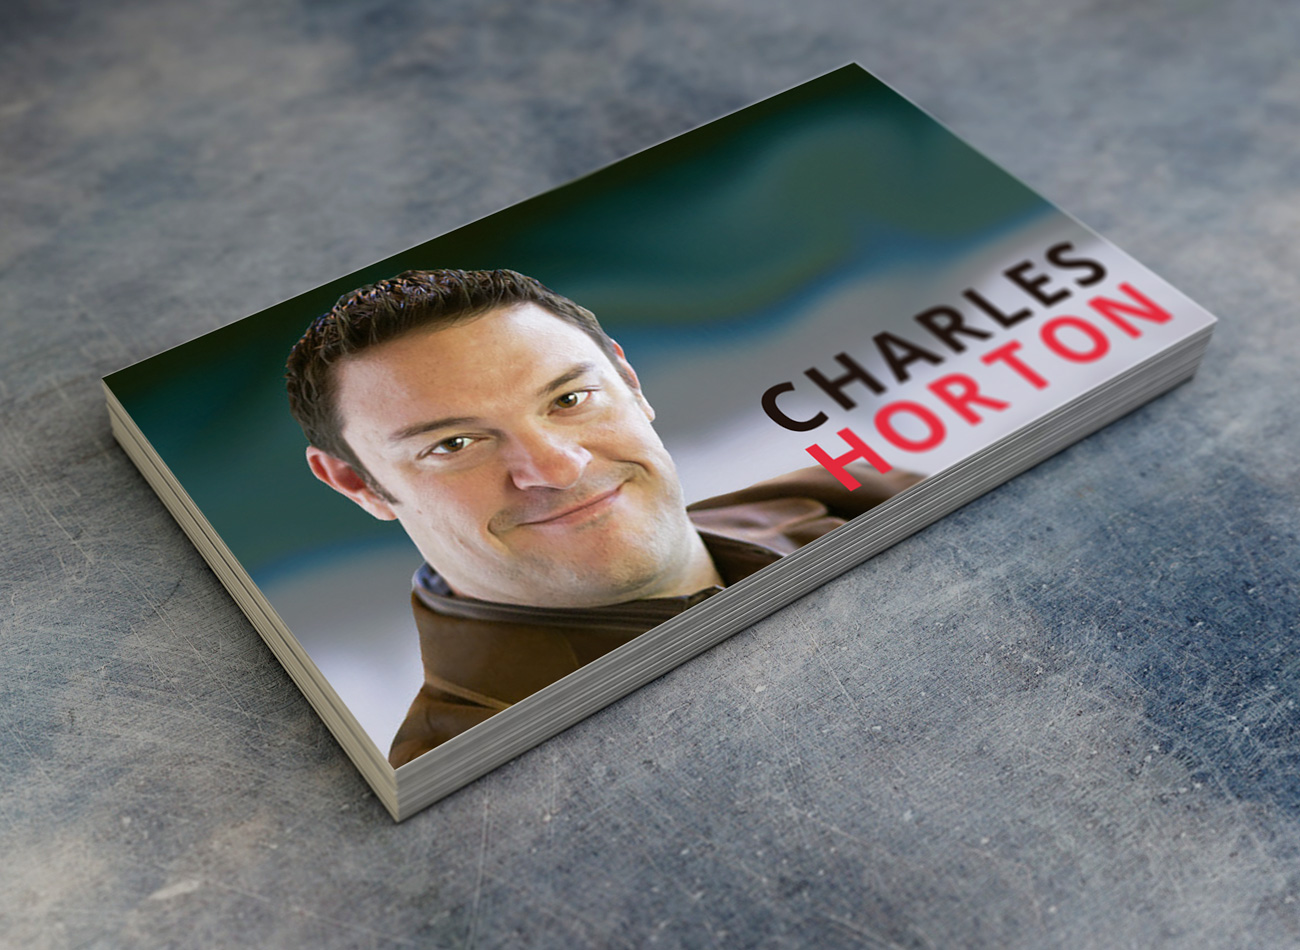 Charles Horton business cards branding material